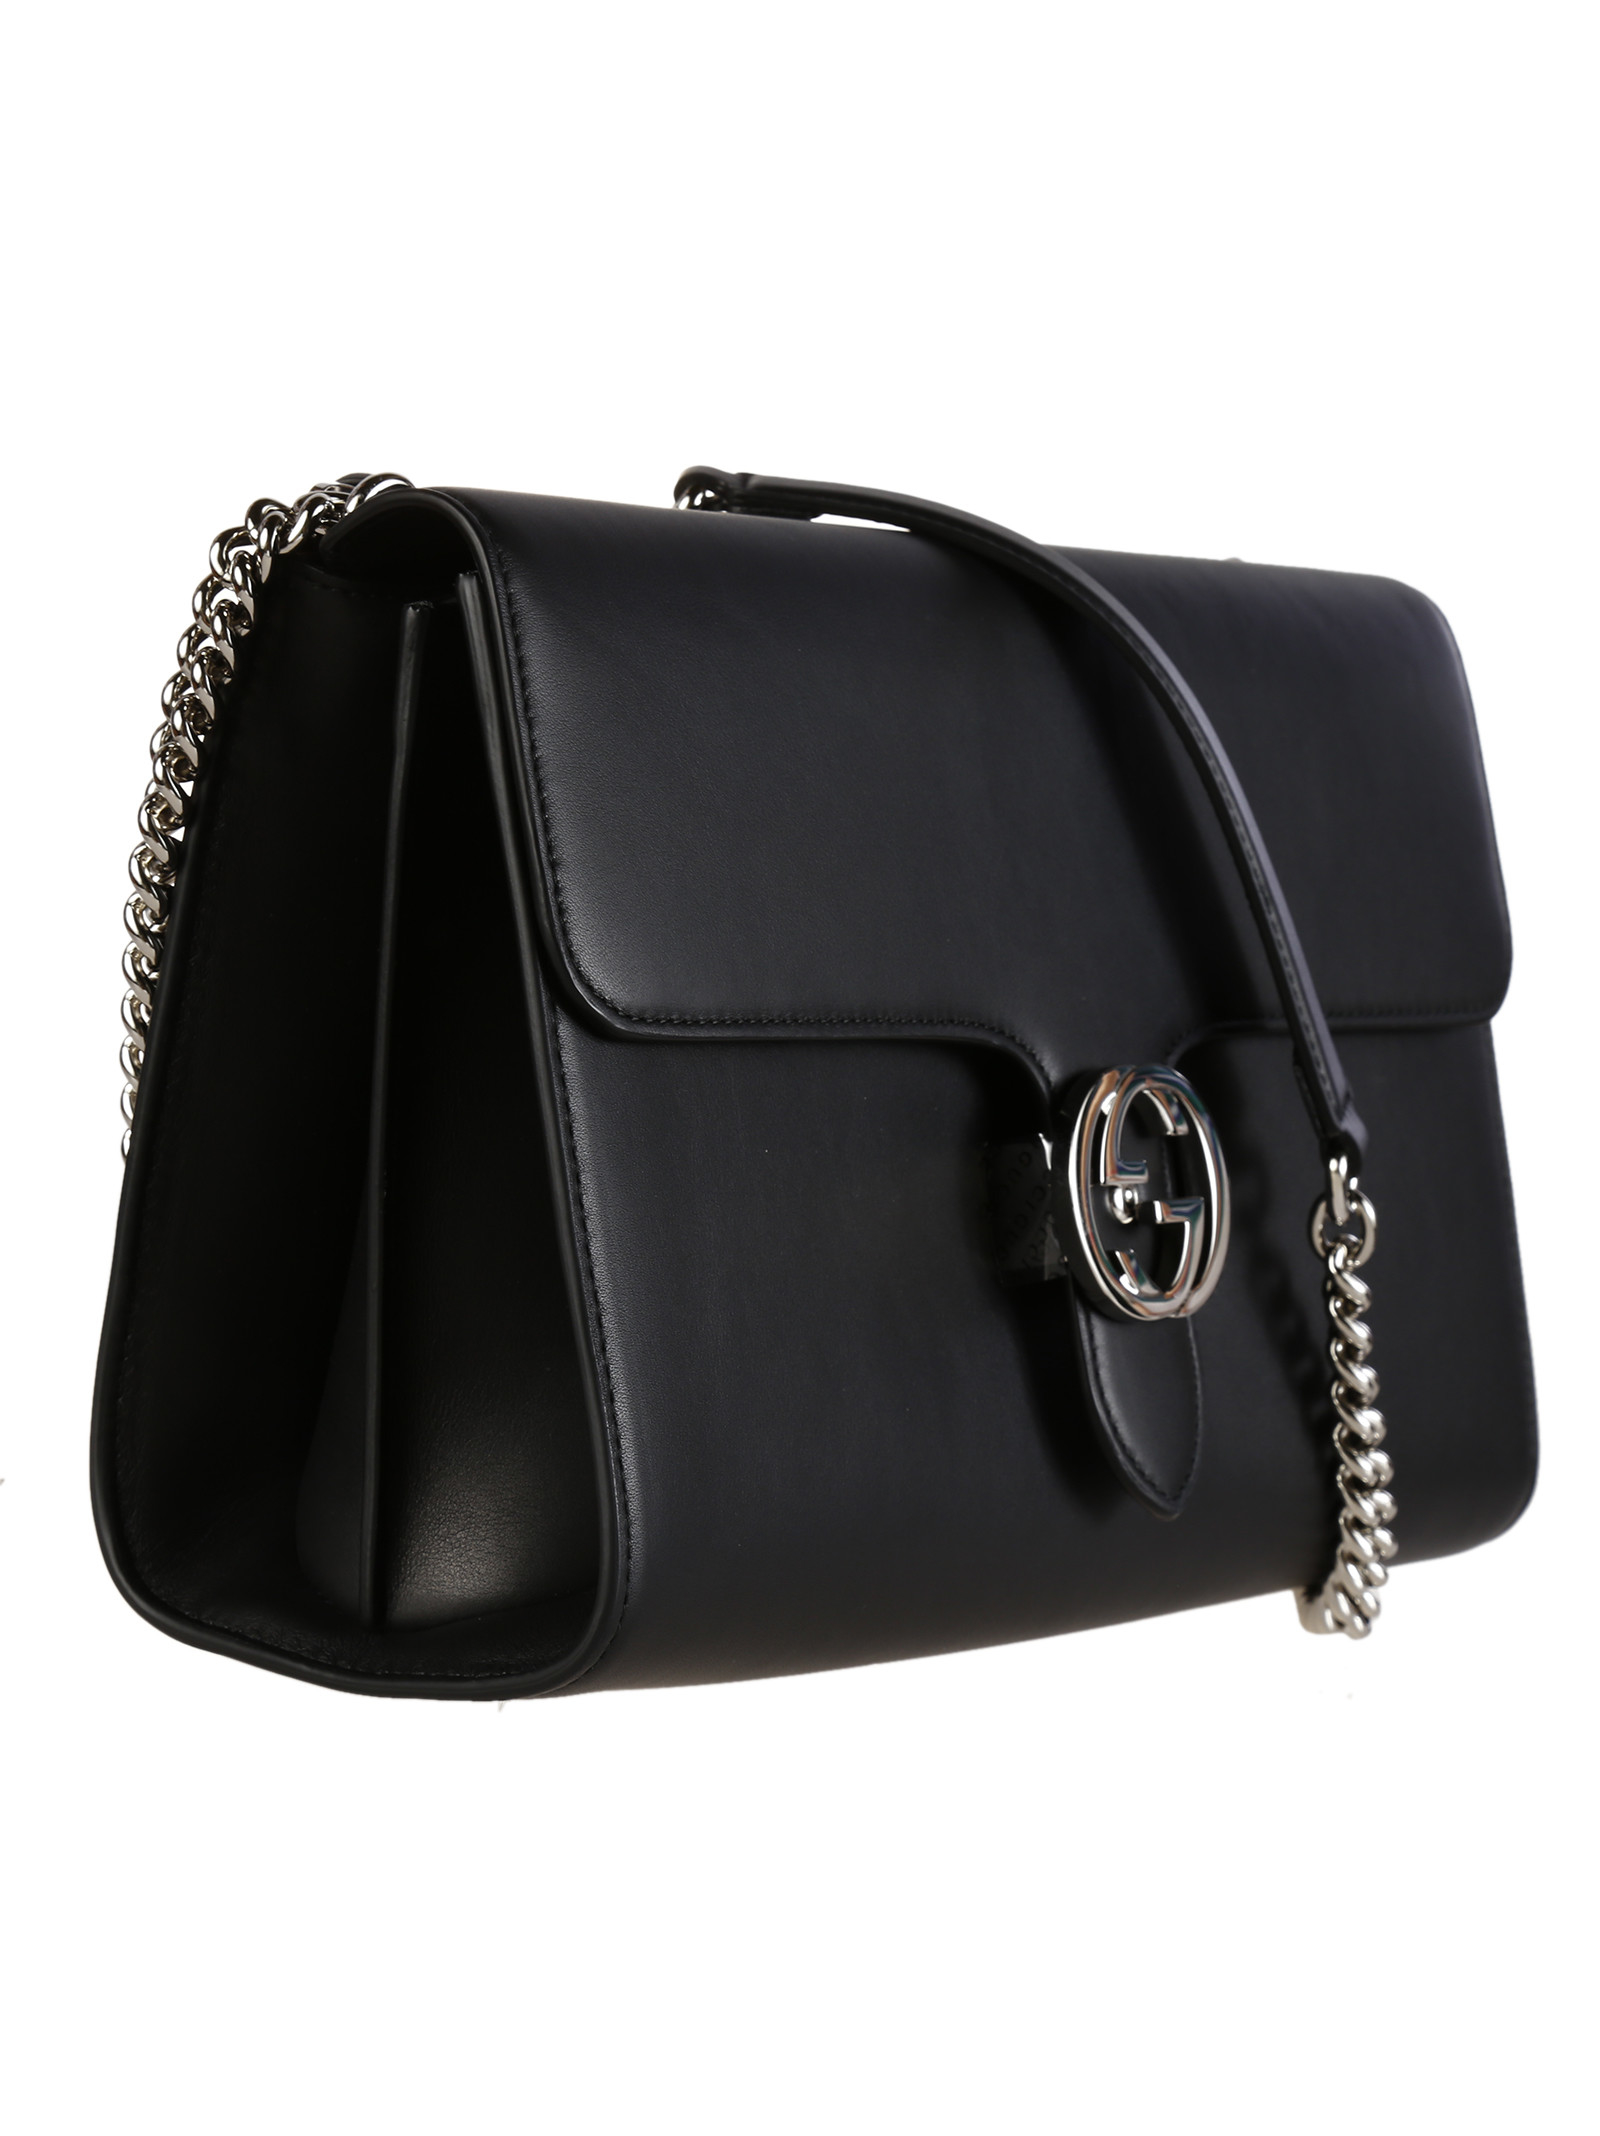 gucci moon leather interlocking shoulder bag in black lyst